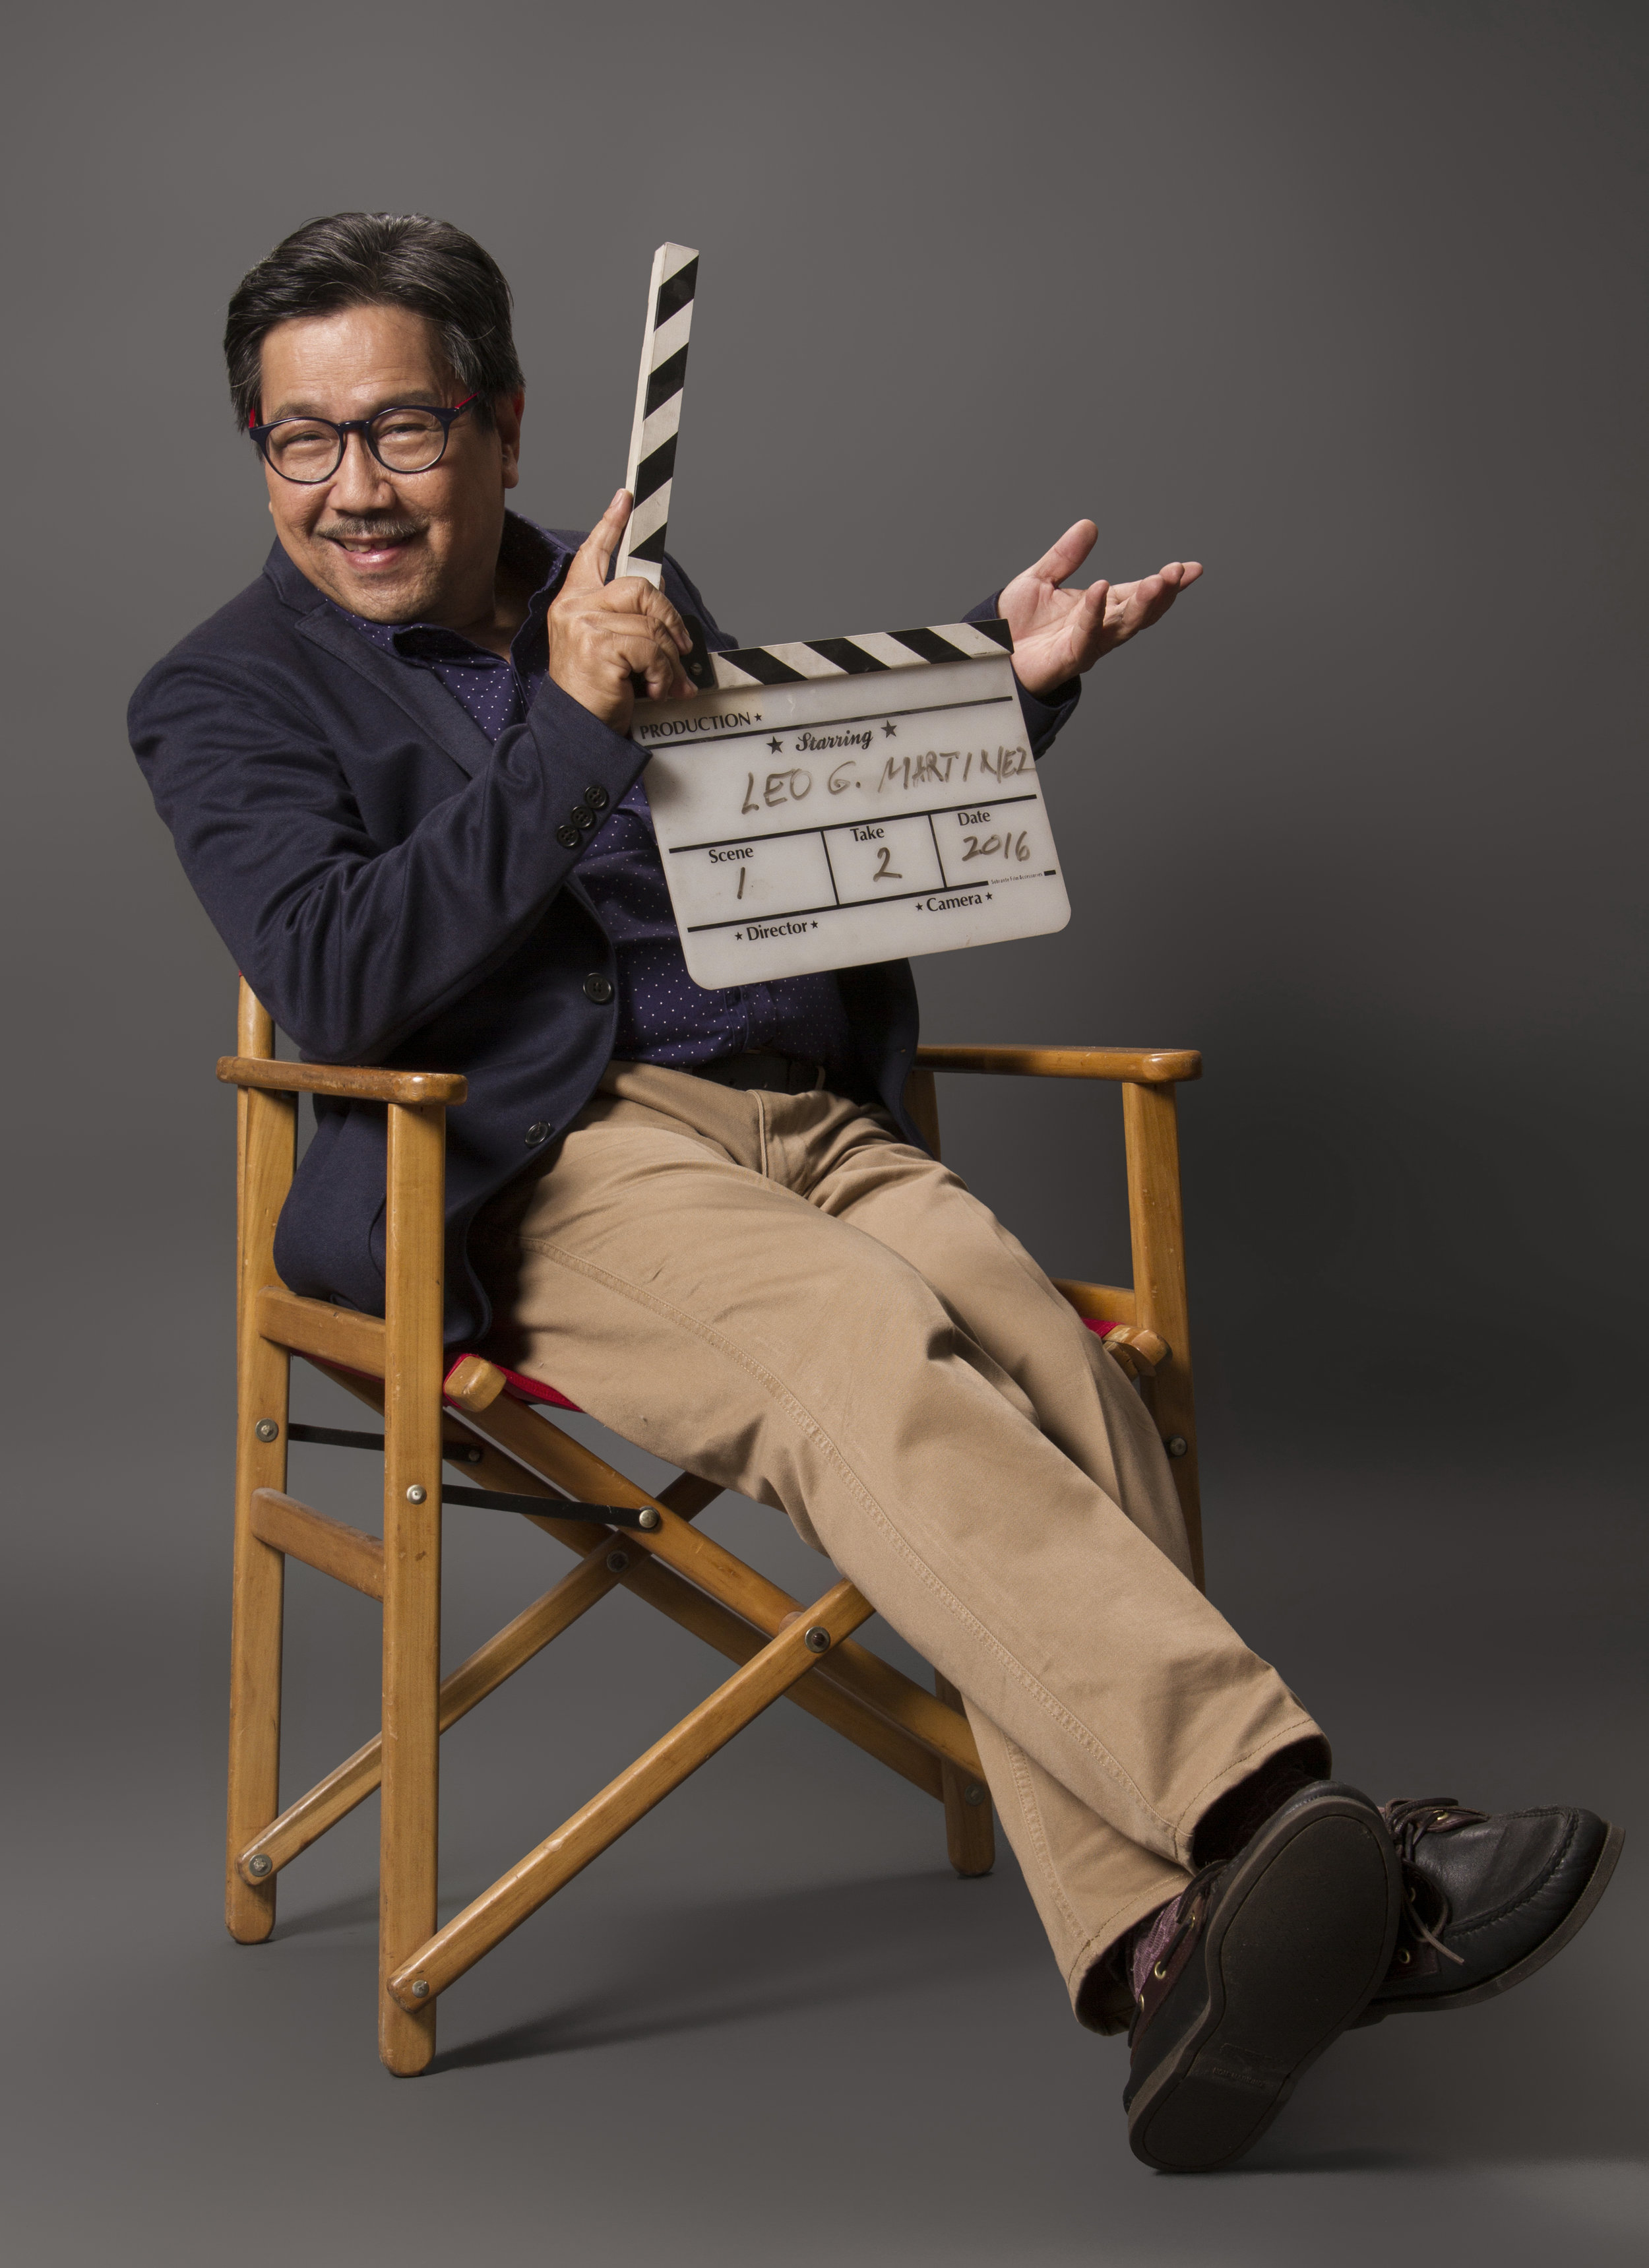 LEO MARTINEZ - Actor | Director